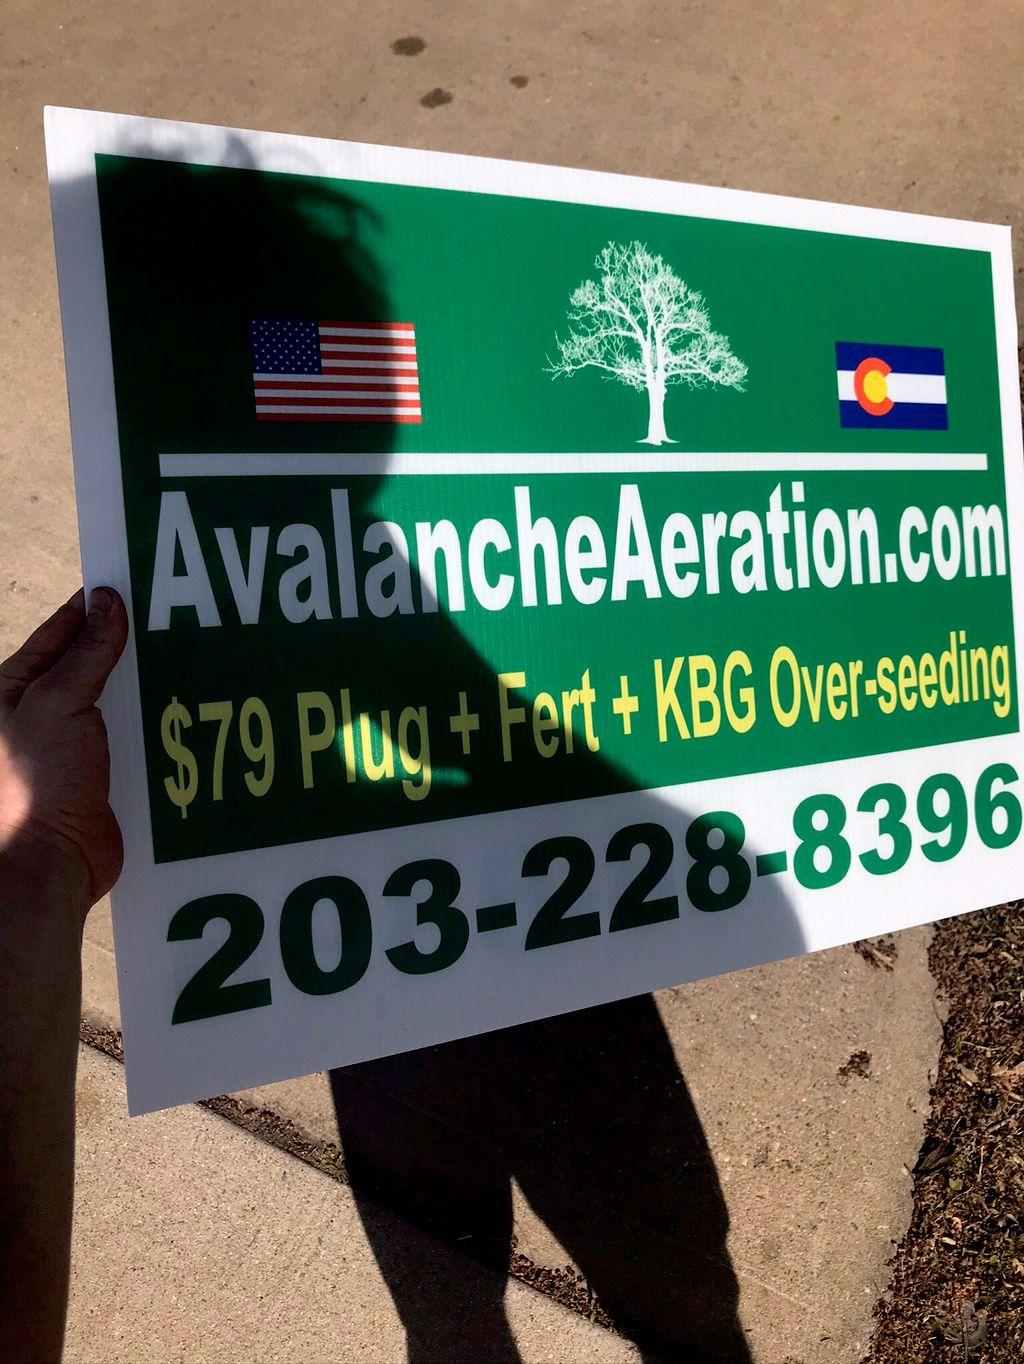 Avalanche Aeration